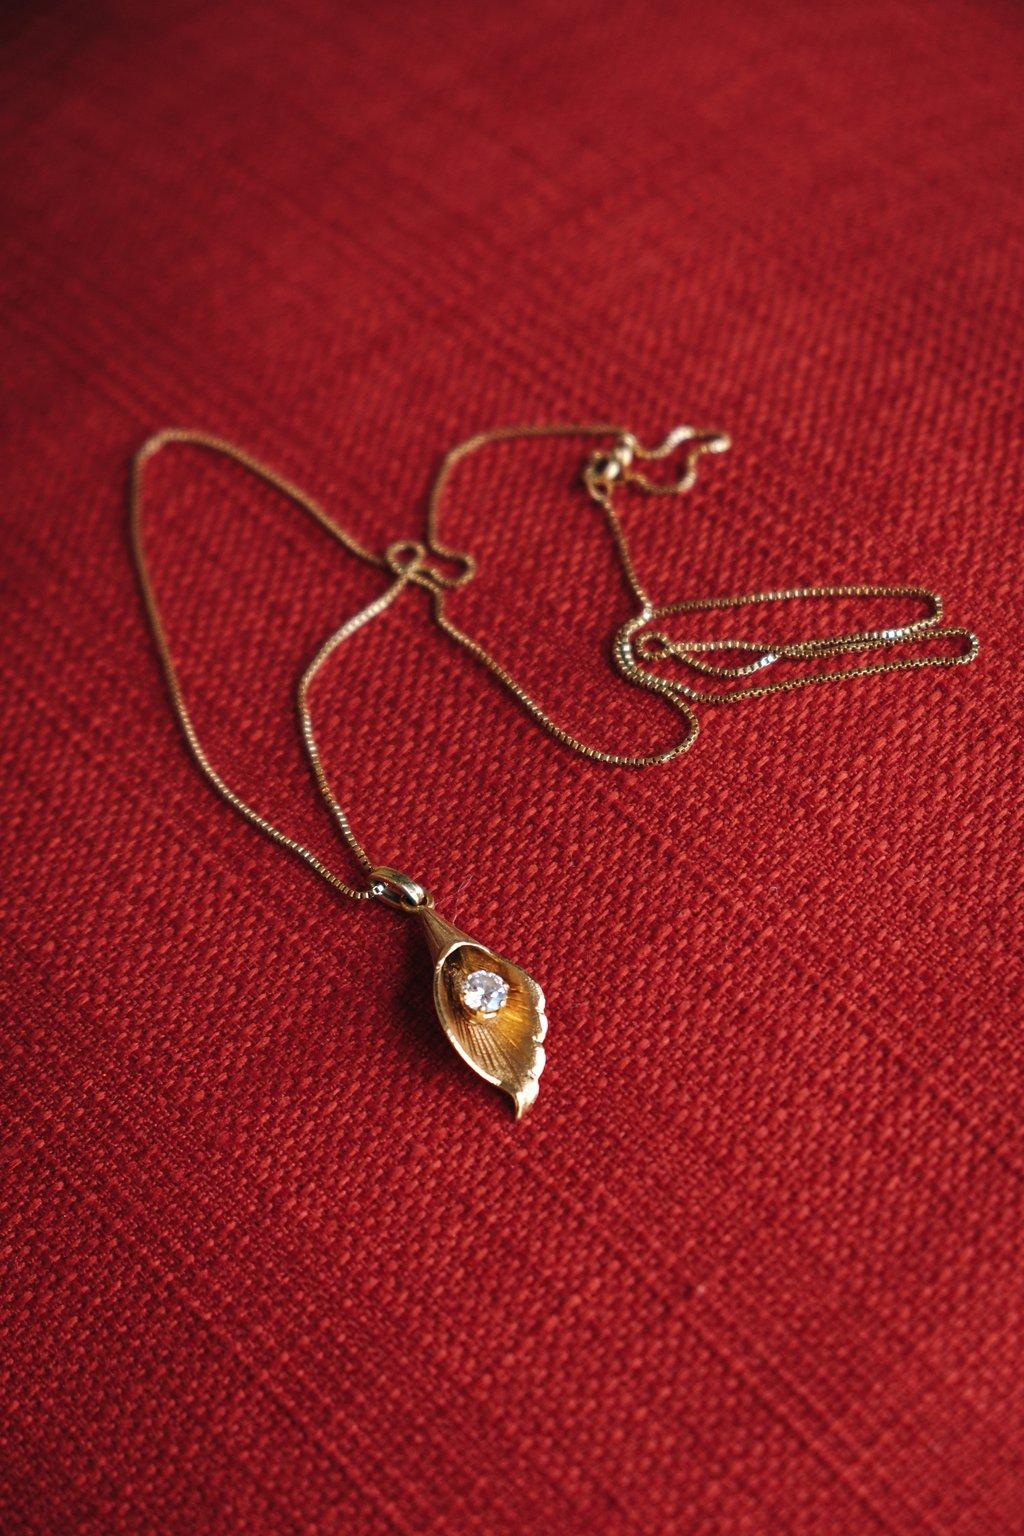 Gorgeous Gold Bride Necklace - Farm-Forest Wedding - The Overwhelmed Bride Wedding Blog